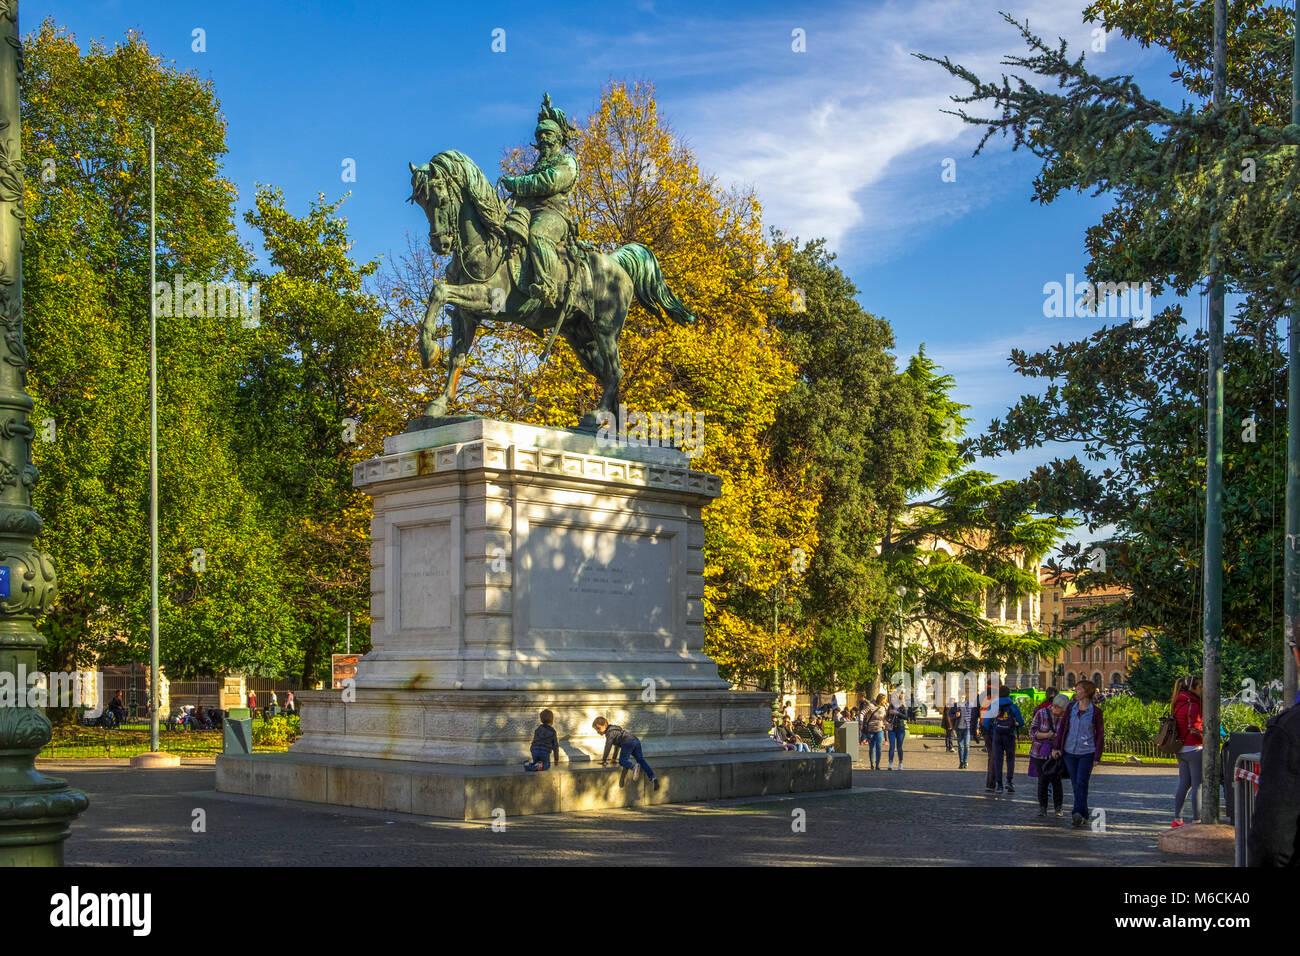 Statue of King Vittorio Emanuele II, (Victor Emmanuel) in Piazza Bra, Verona, Italy - Stock Image